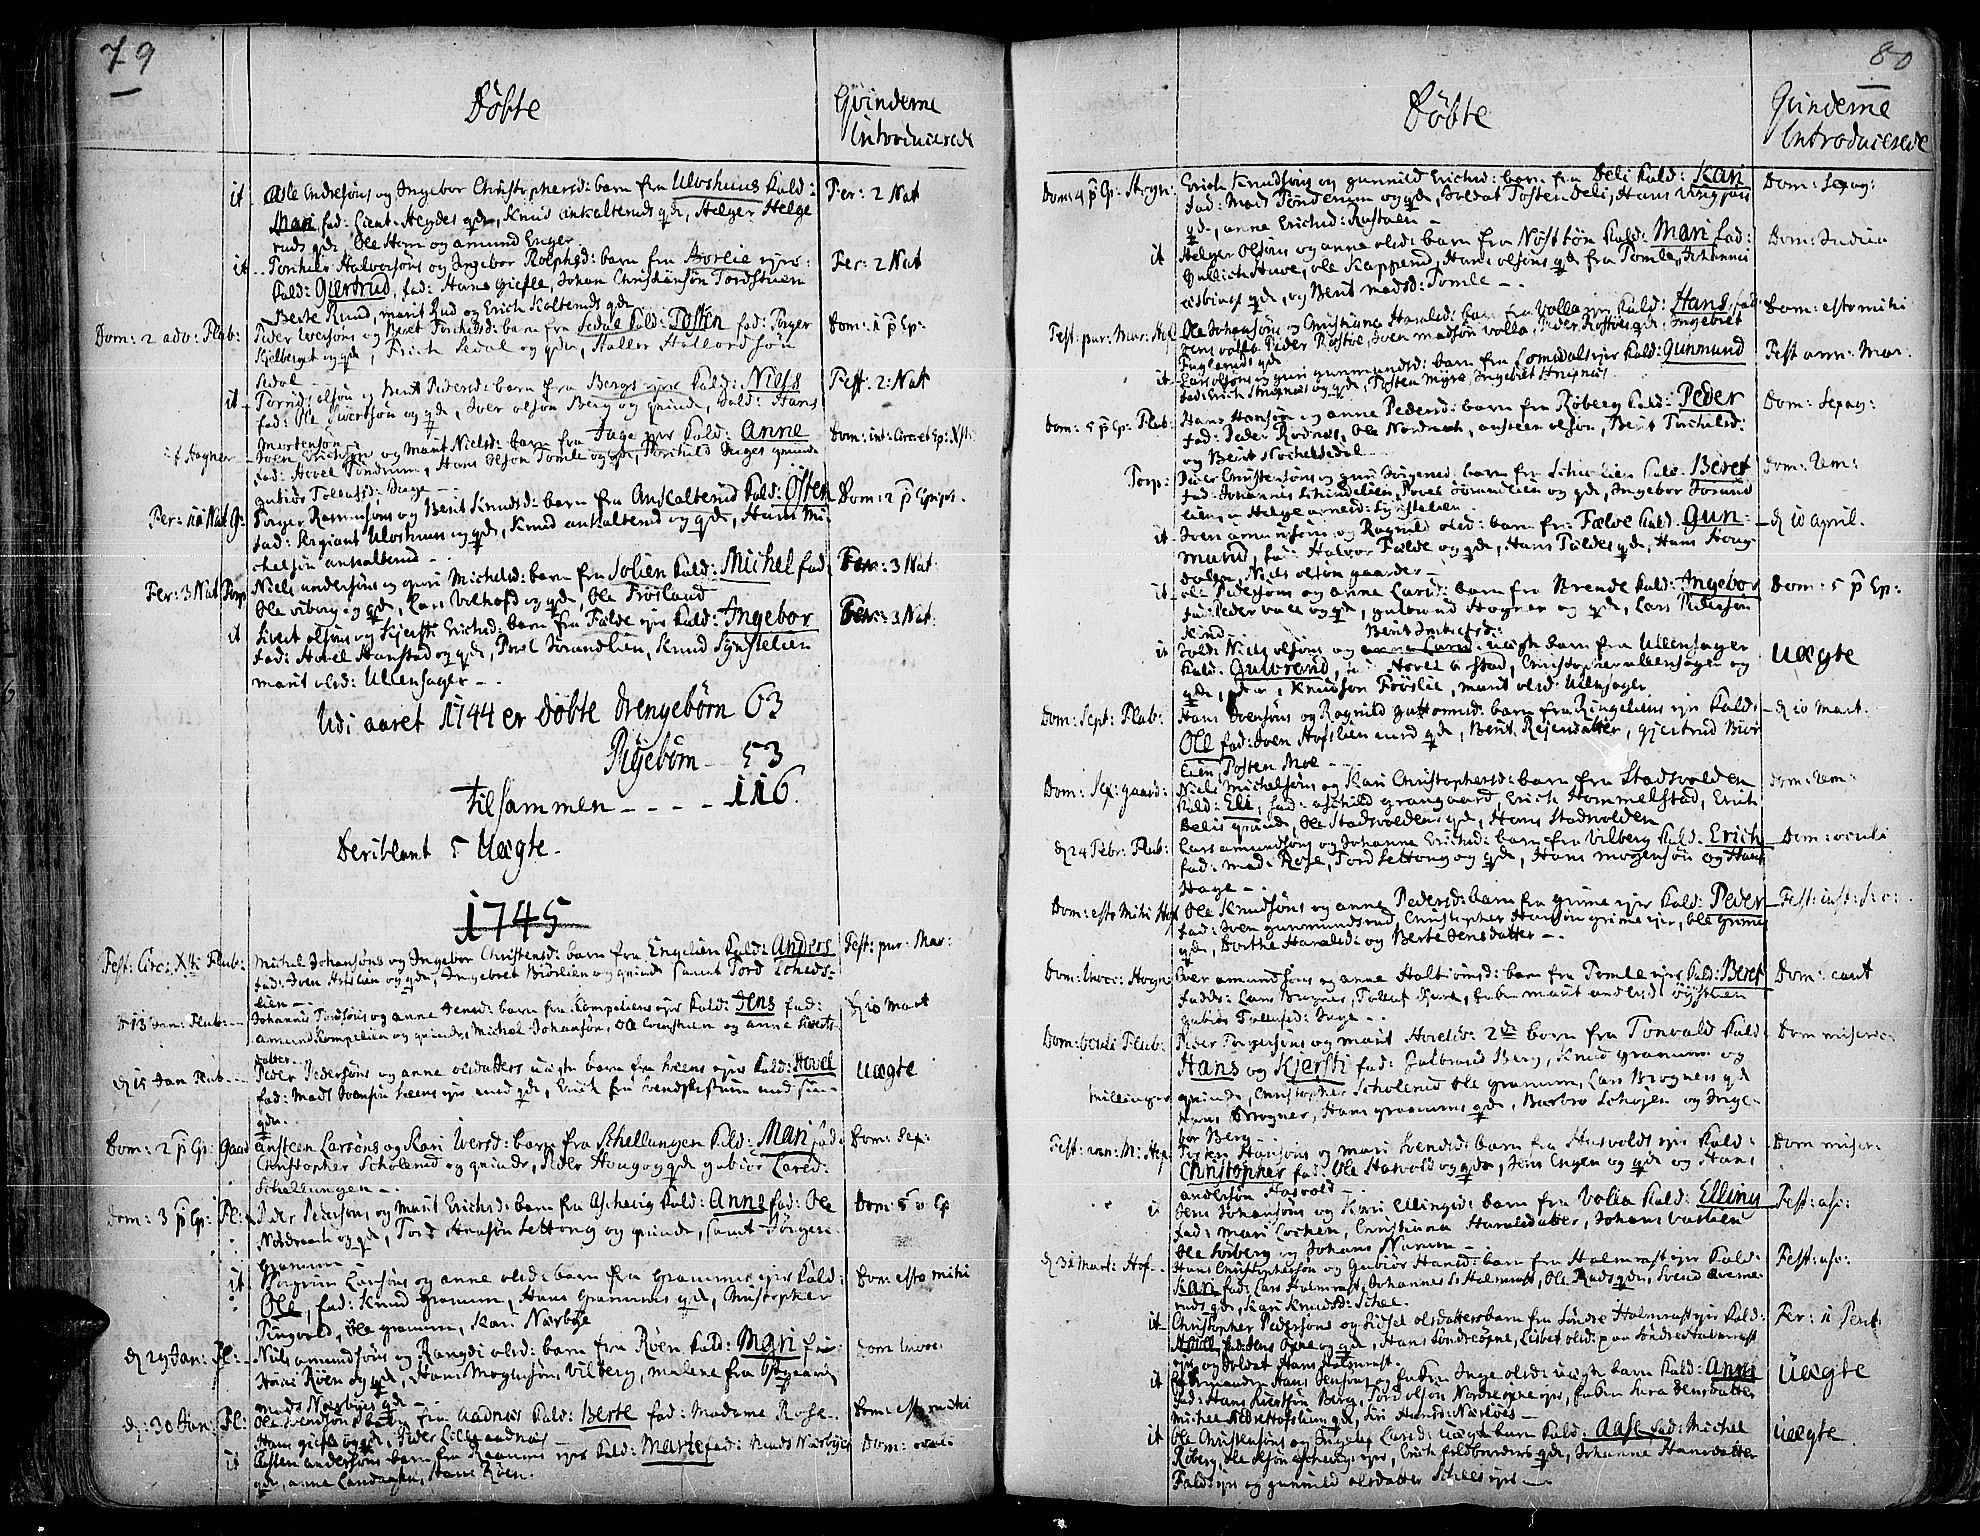 SAH, Land prestekontor, Ministerialbok nr. 2, 1733-1764, s. 79-80